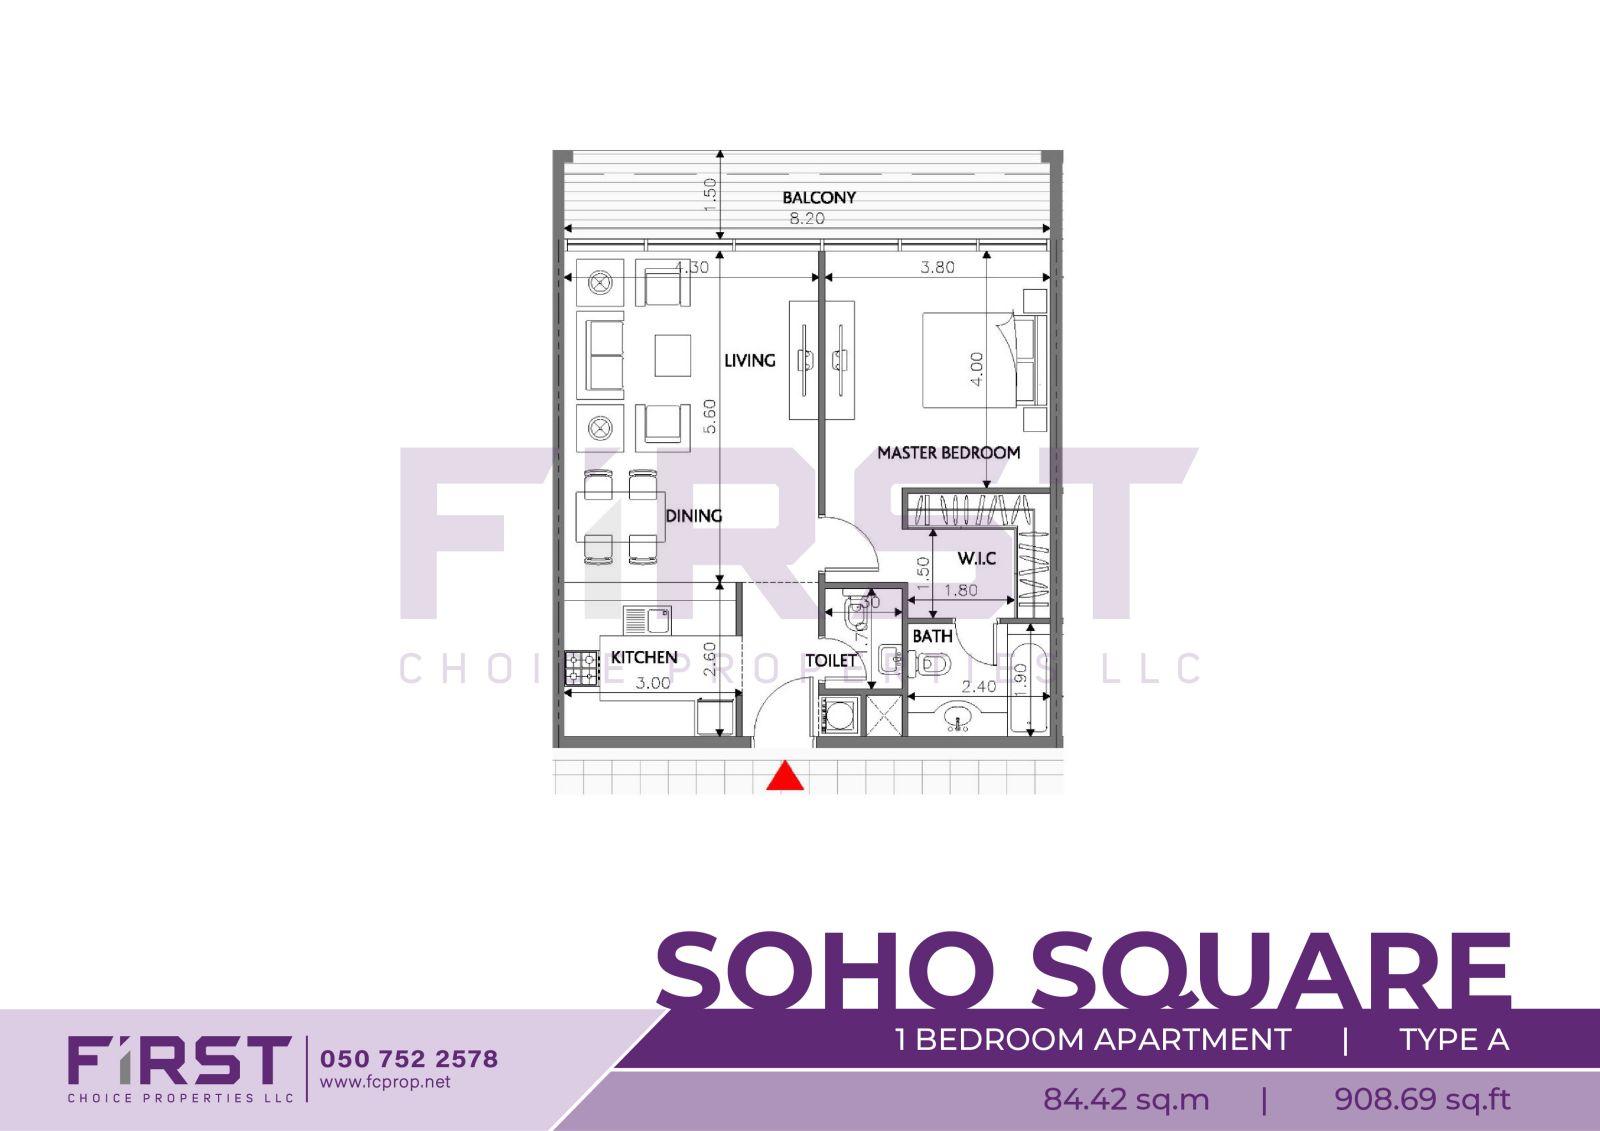 Floor Plan of 1 Bedroom Apartment Type A in Soho Square Saadiyat Island Abu Dhabi UAE 84.42 sq.m 908.69 sq.ft .jpg